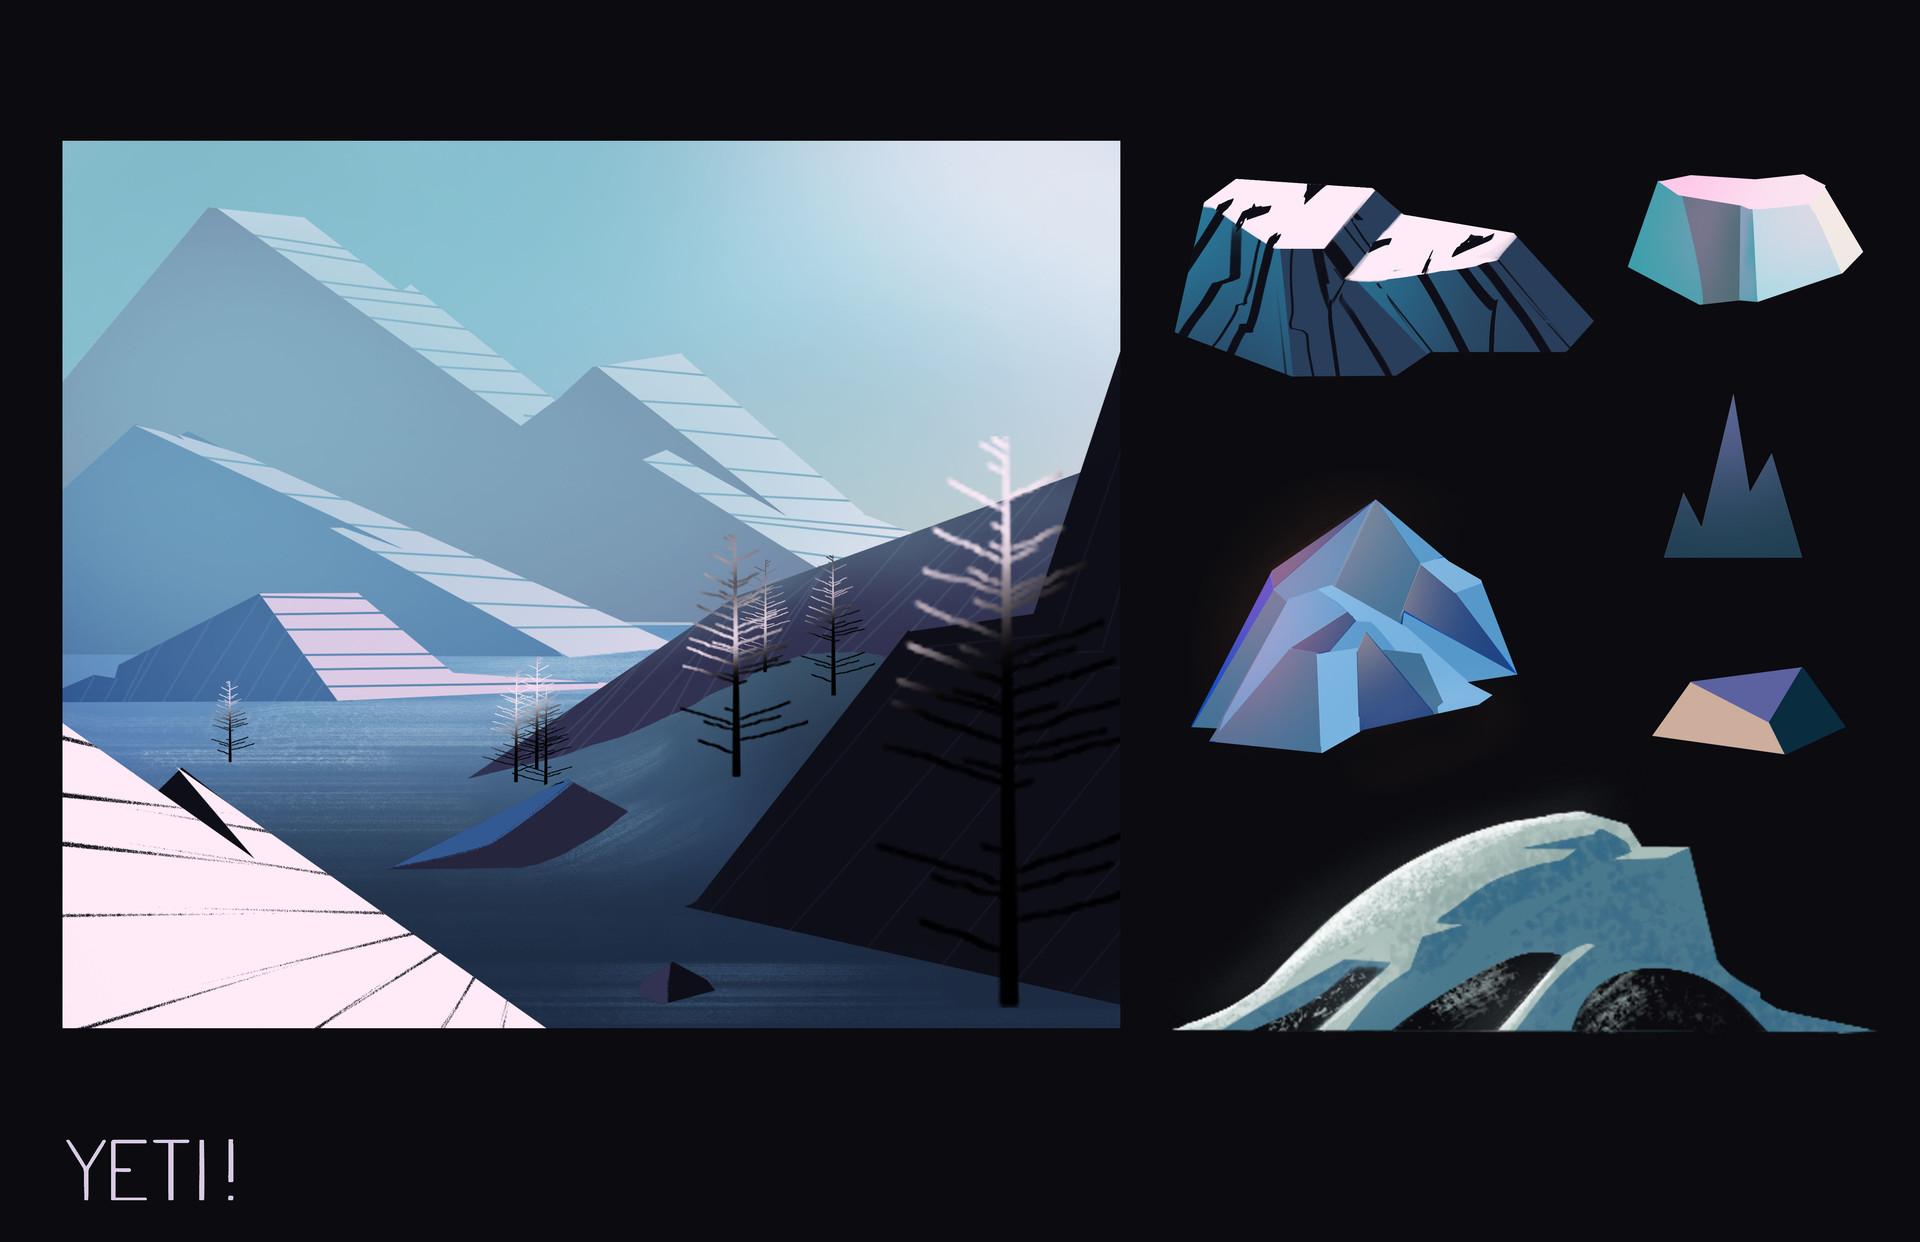 ArtStation - Yeti Environments, Chris Zollna